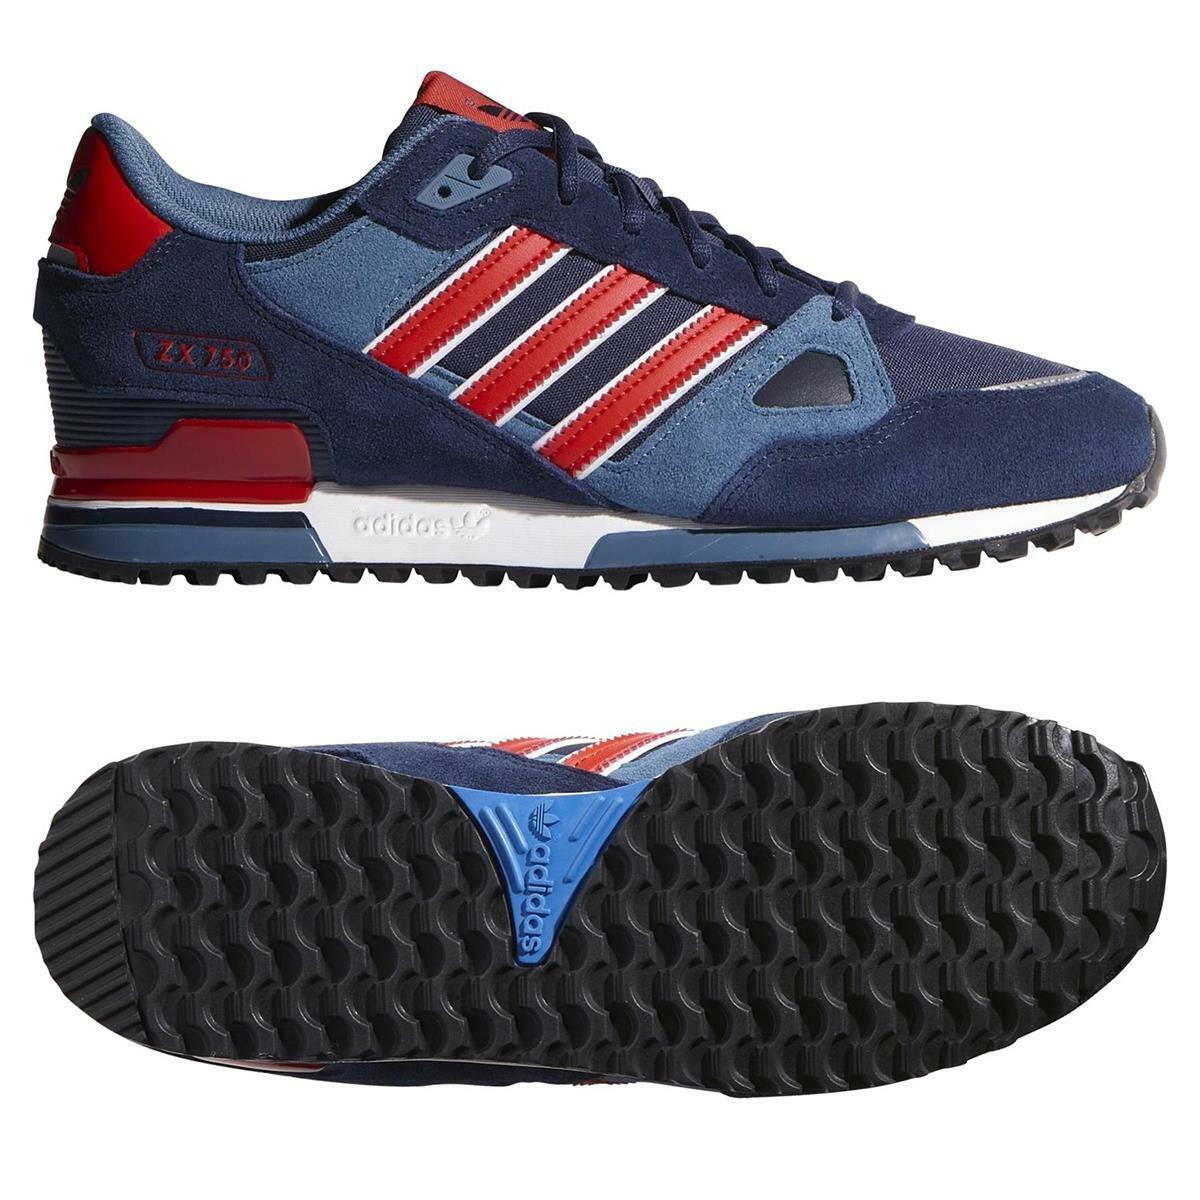 Adidas ORIGINALS herren ZX 750 TRAINERS schuhe Turnschuhe NAVY rot RETRO VINTAGE NEW